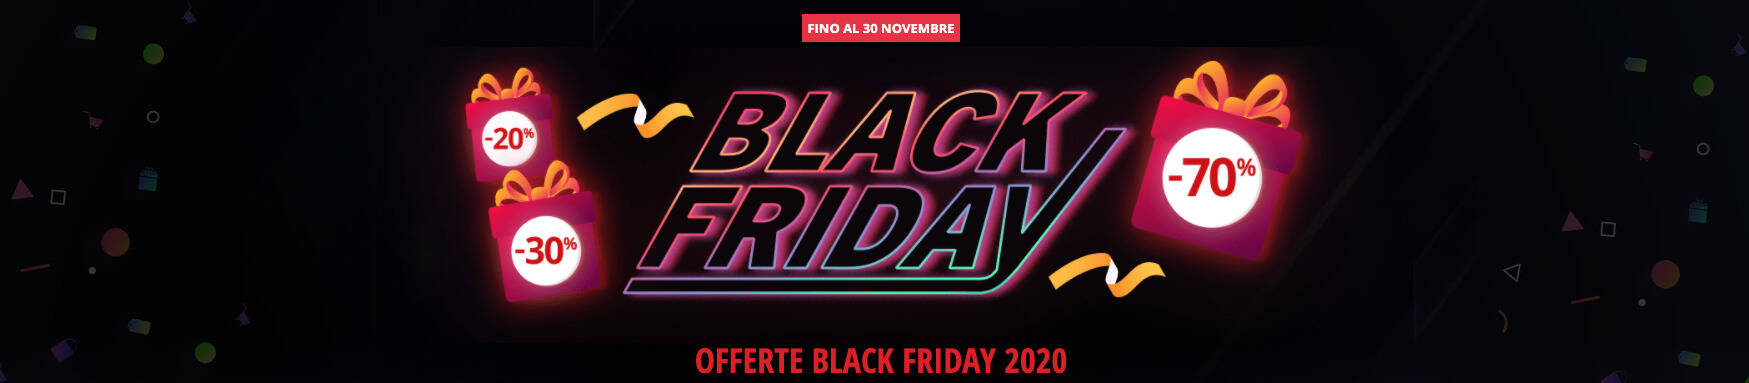 banner ibs black friday